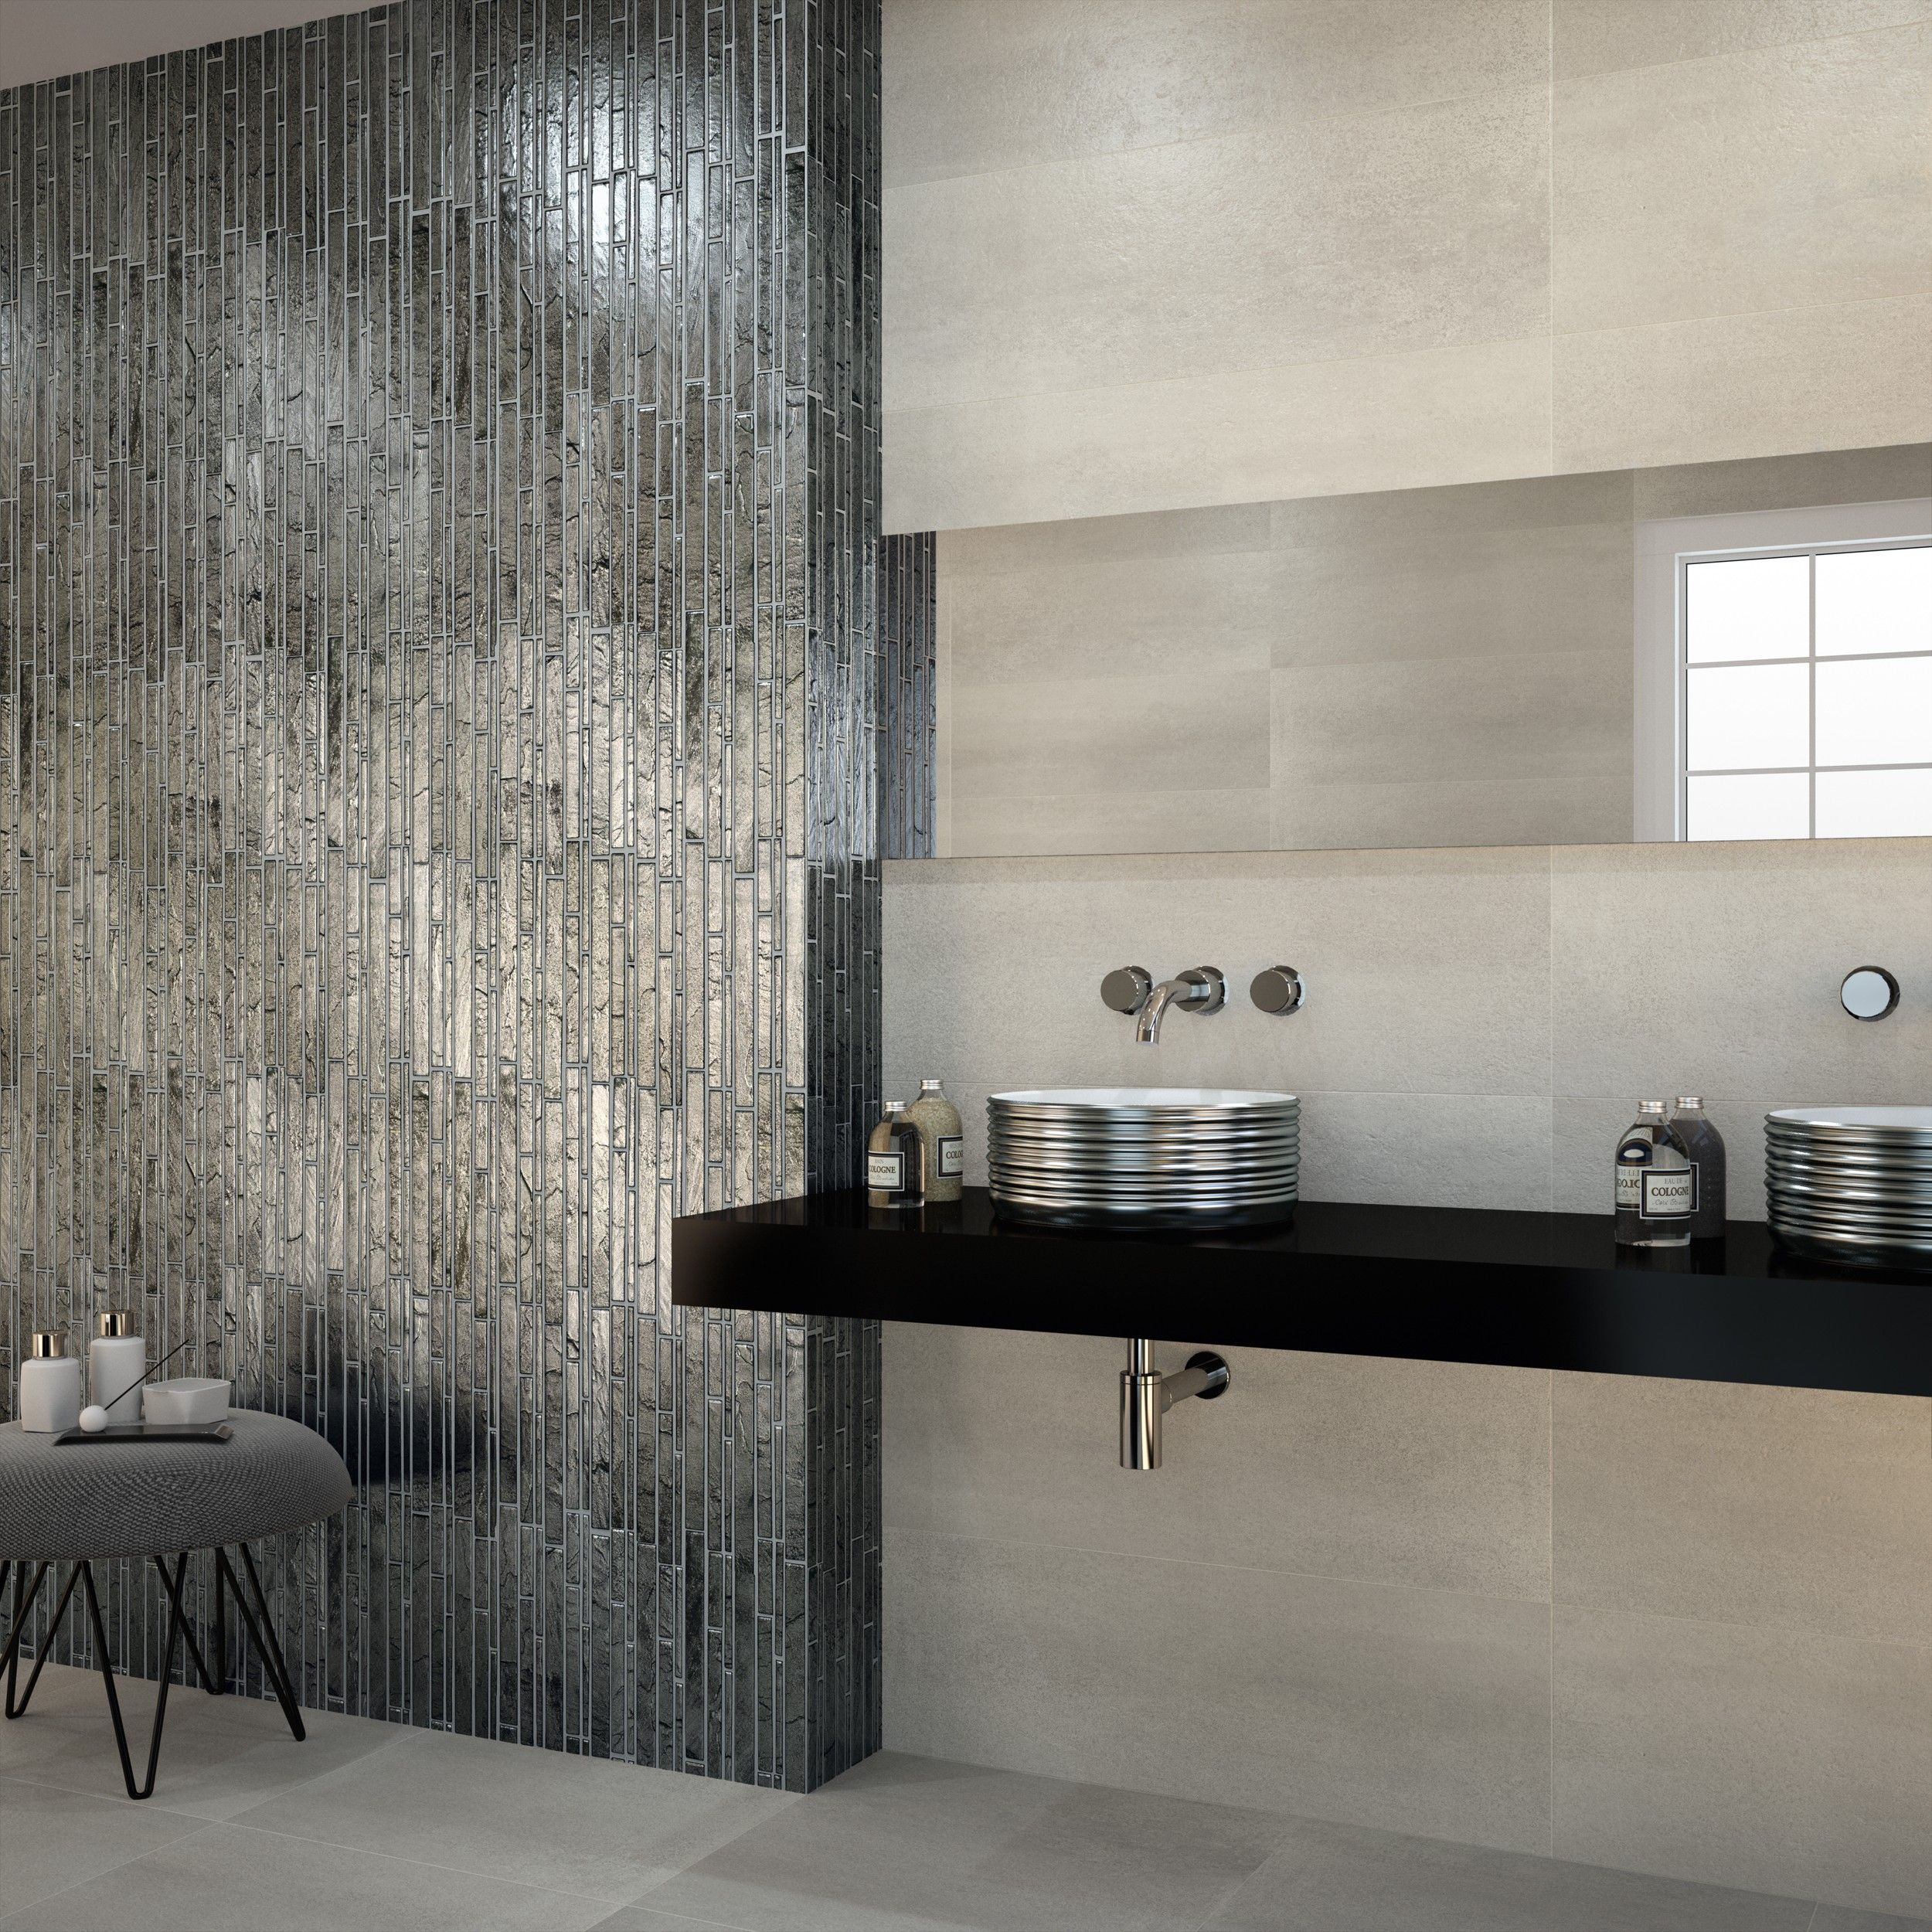 "HIPSTER SMOKE 100,100x100,10 cm./1010.10""x3100.100"" - Wall tiling - Ceramics"